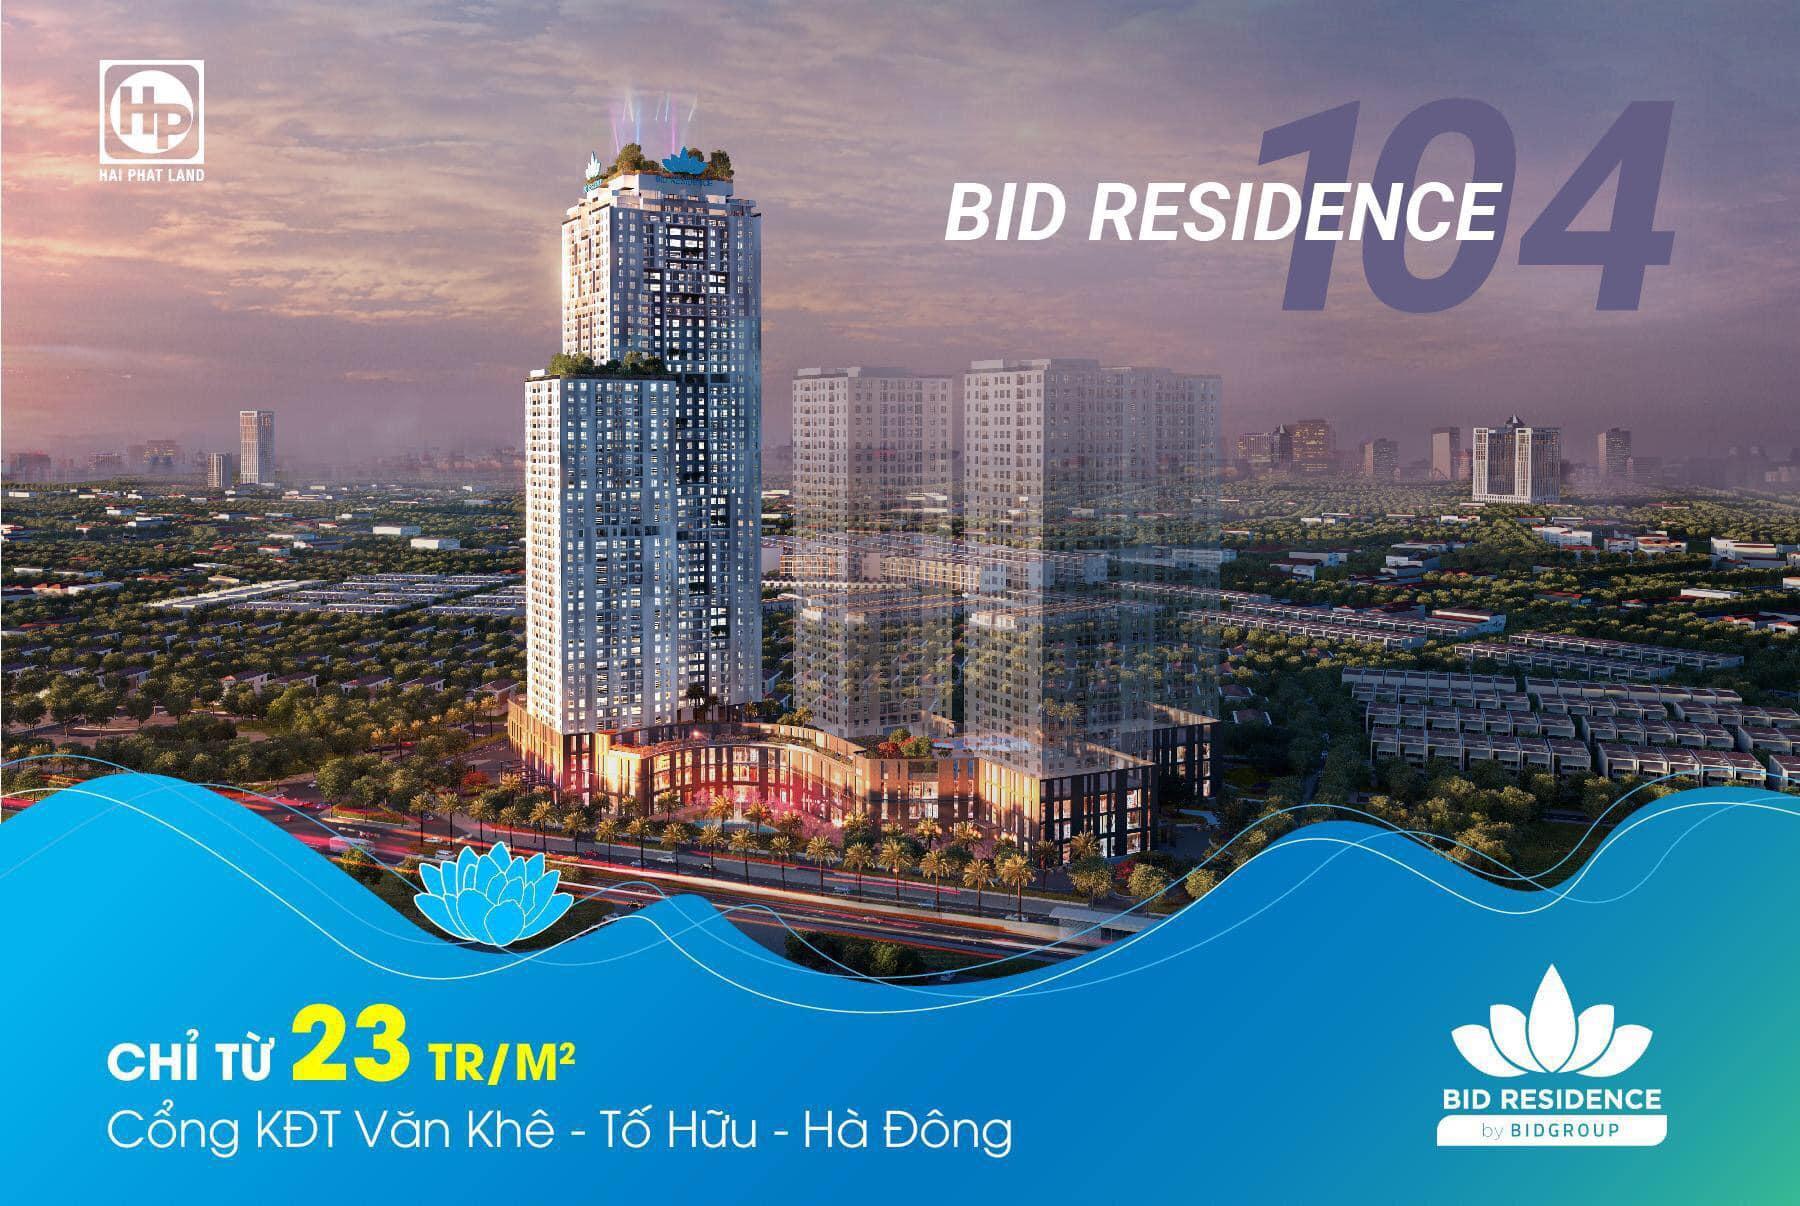 tong quan bid residence104 7